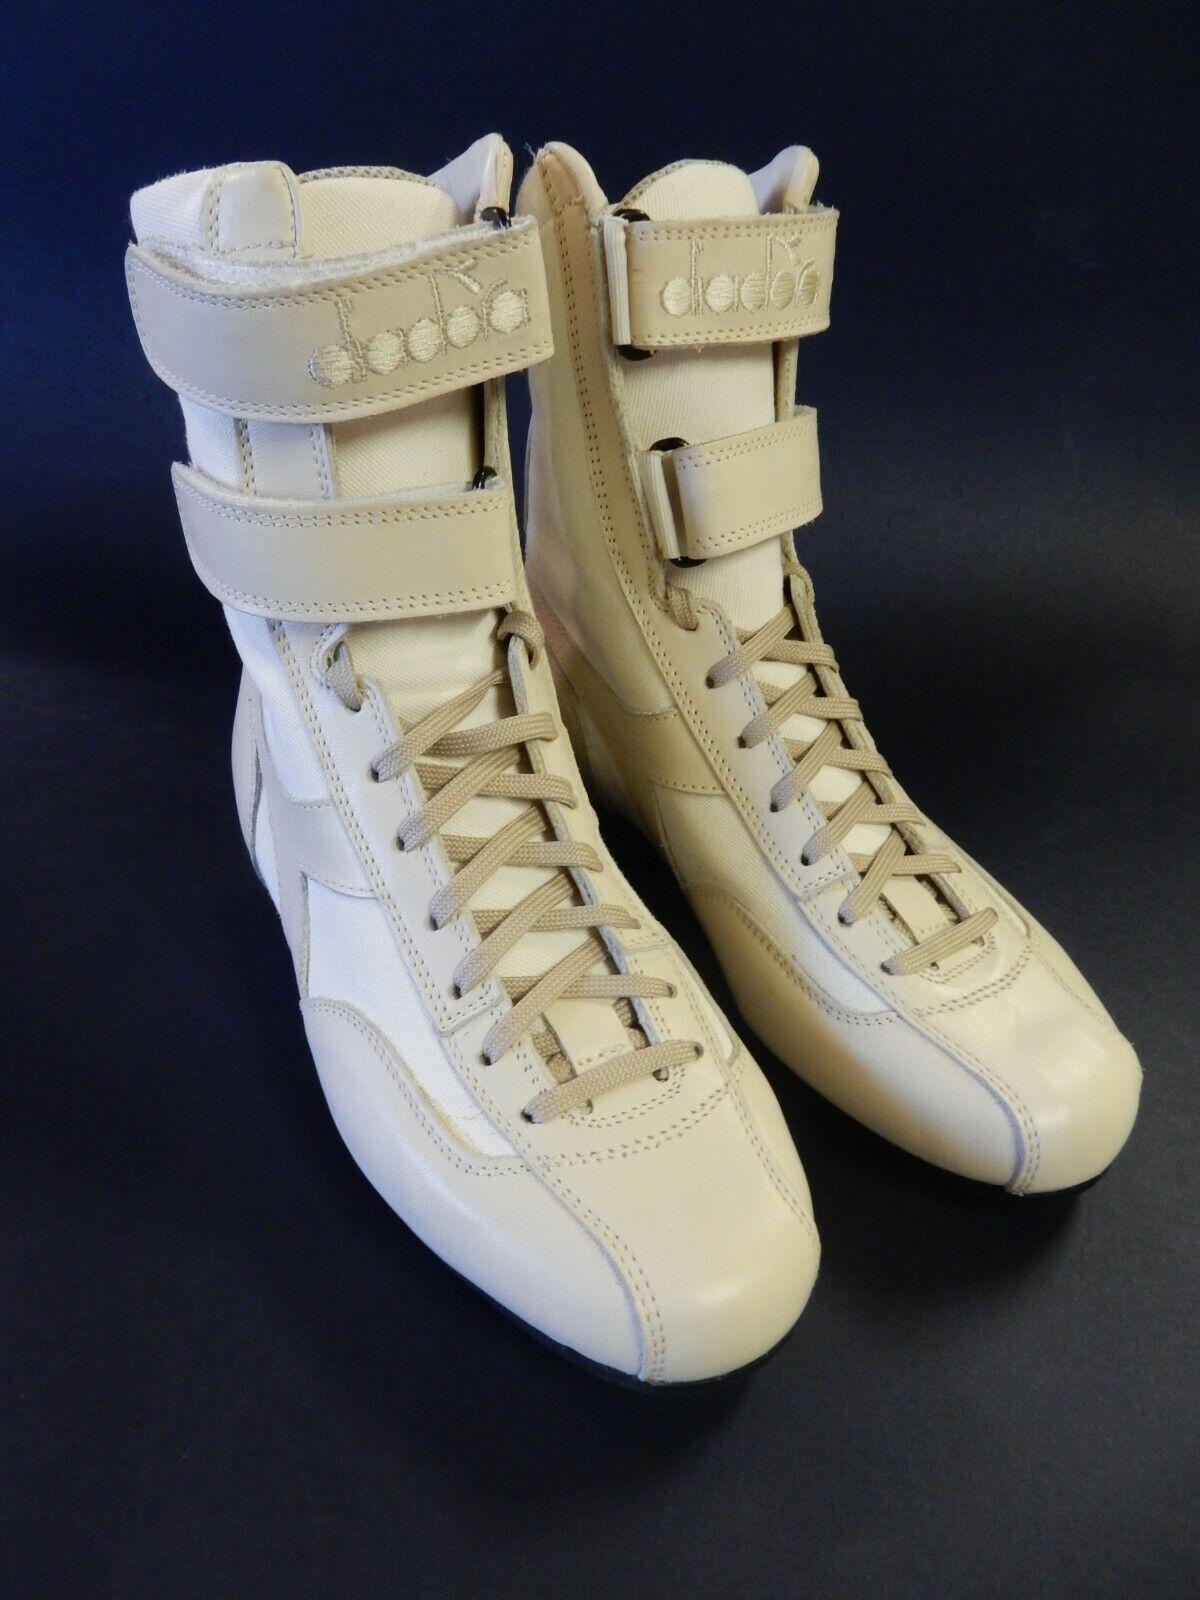 Diadora Diadora Diadora HERITAGE GP Fórmula n Entrenador botas Beige Tamaño UK 4  100% precio garantizado